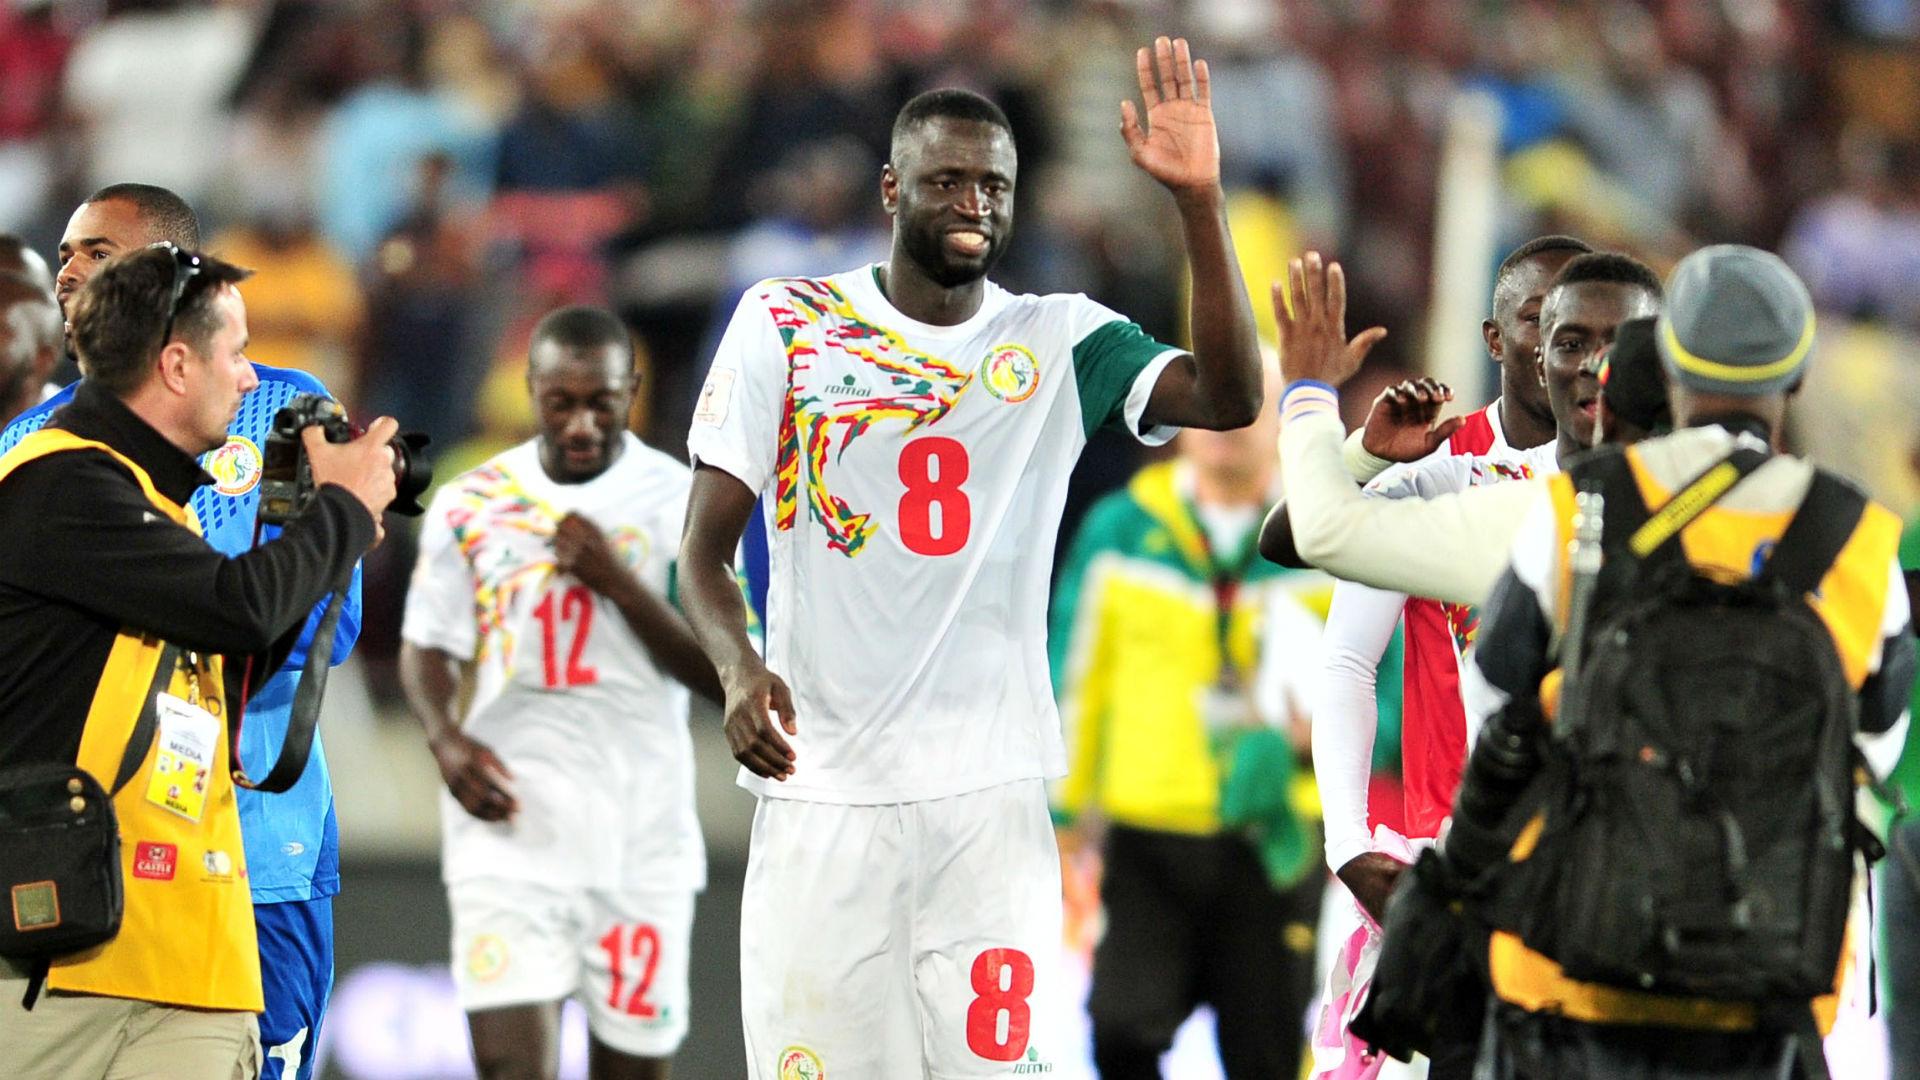 senegal-captain-cheikhou-kouyate-after-a-match-against-south-africa_191i5tuzw5pp91joyhrffcmstf.jpg